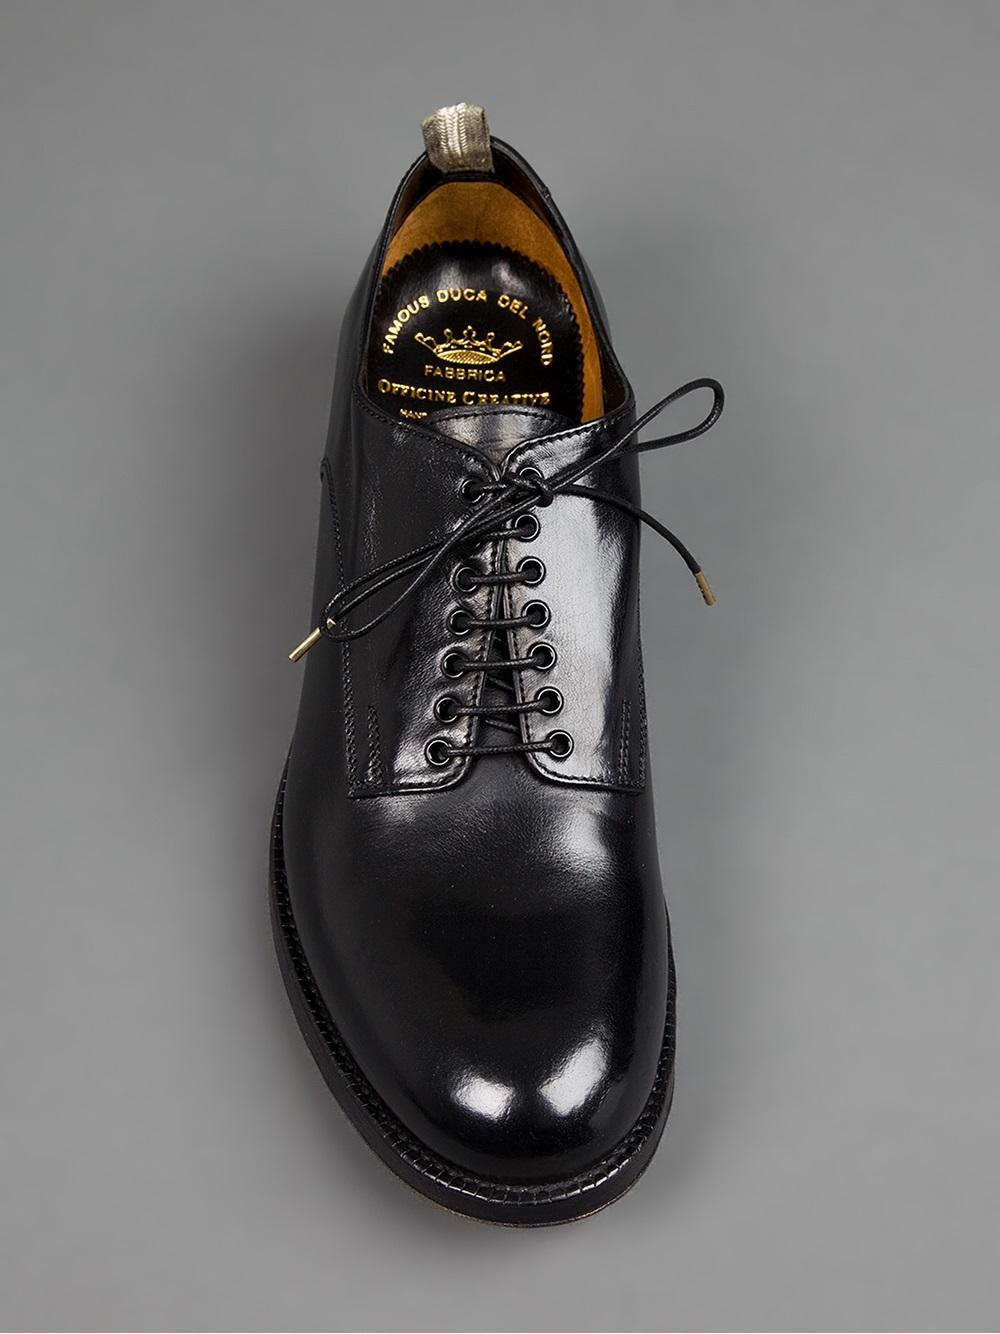 Lyst Officine Creative Officine Creative Far Gone Derby Shoe In Black For Men